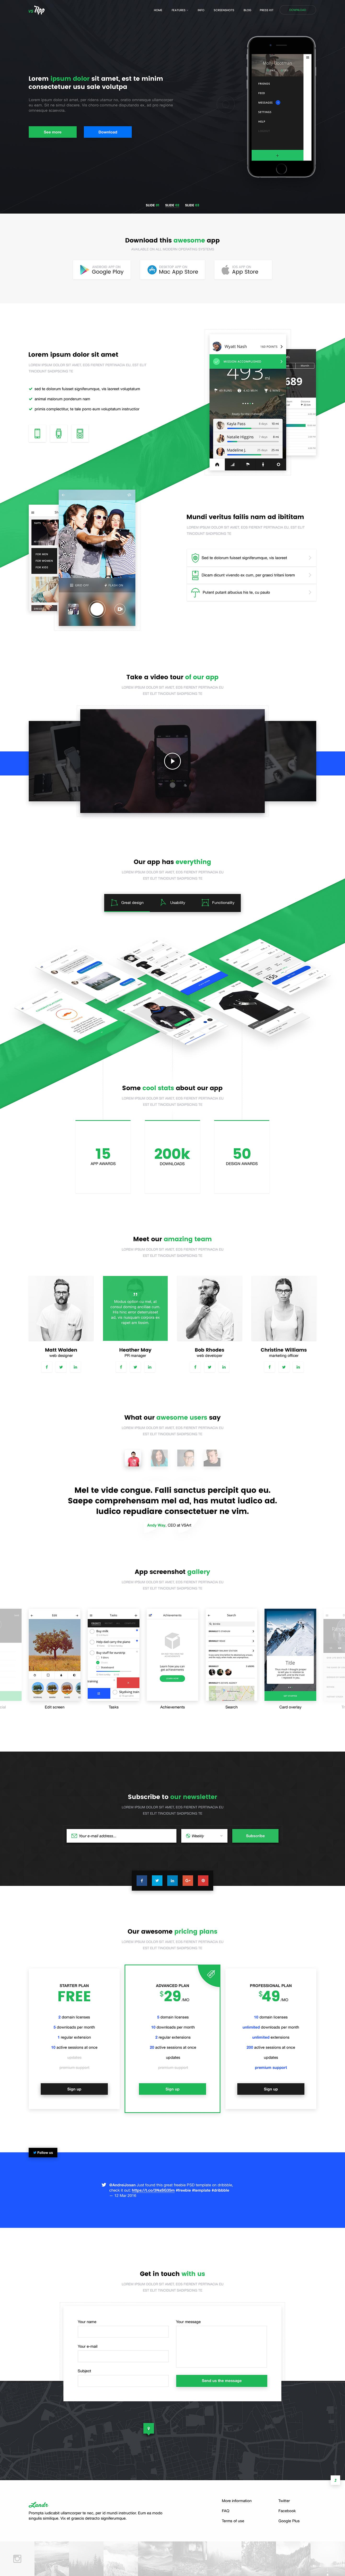 2.jpg by Andrei Josan Psd templates, Web design examples